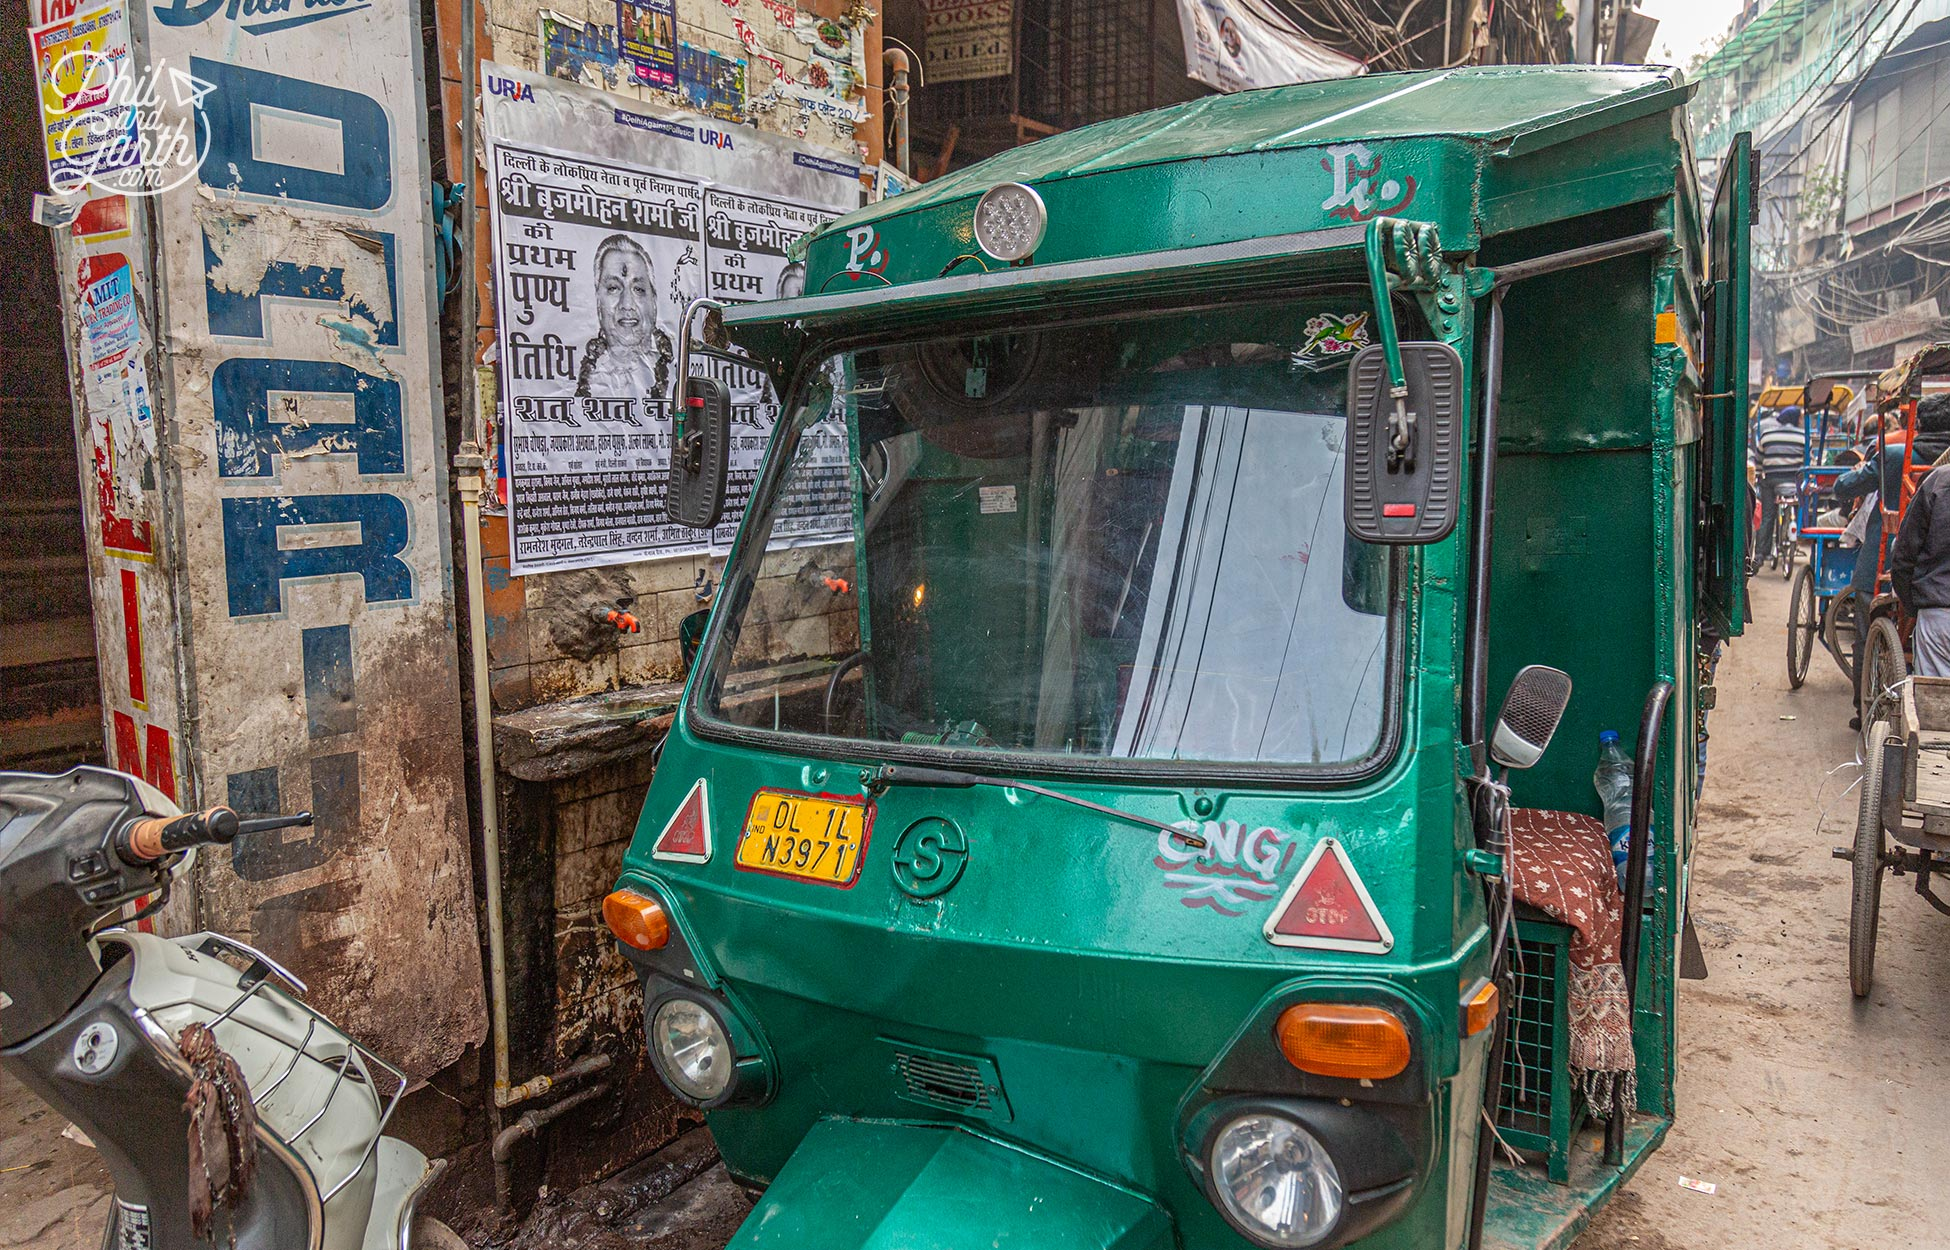 Chandi Chowk market is closed on Sundays